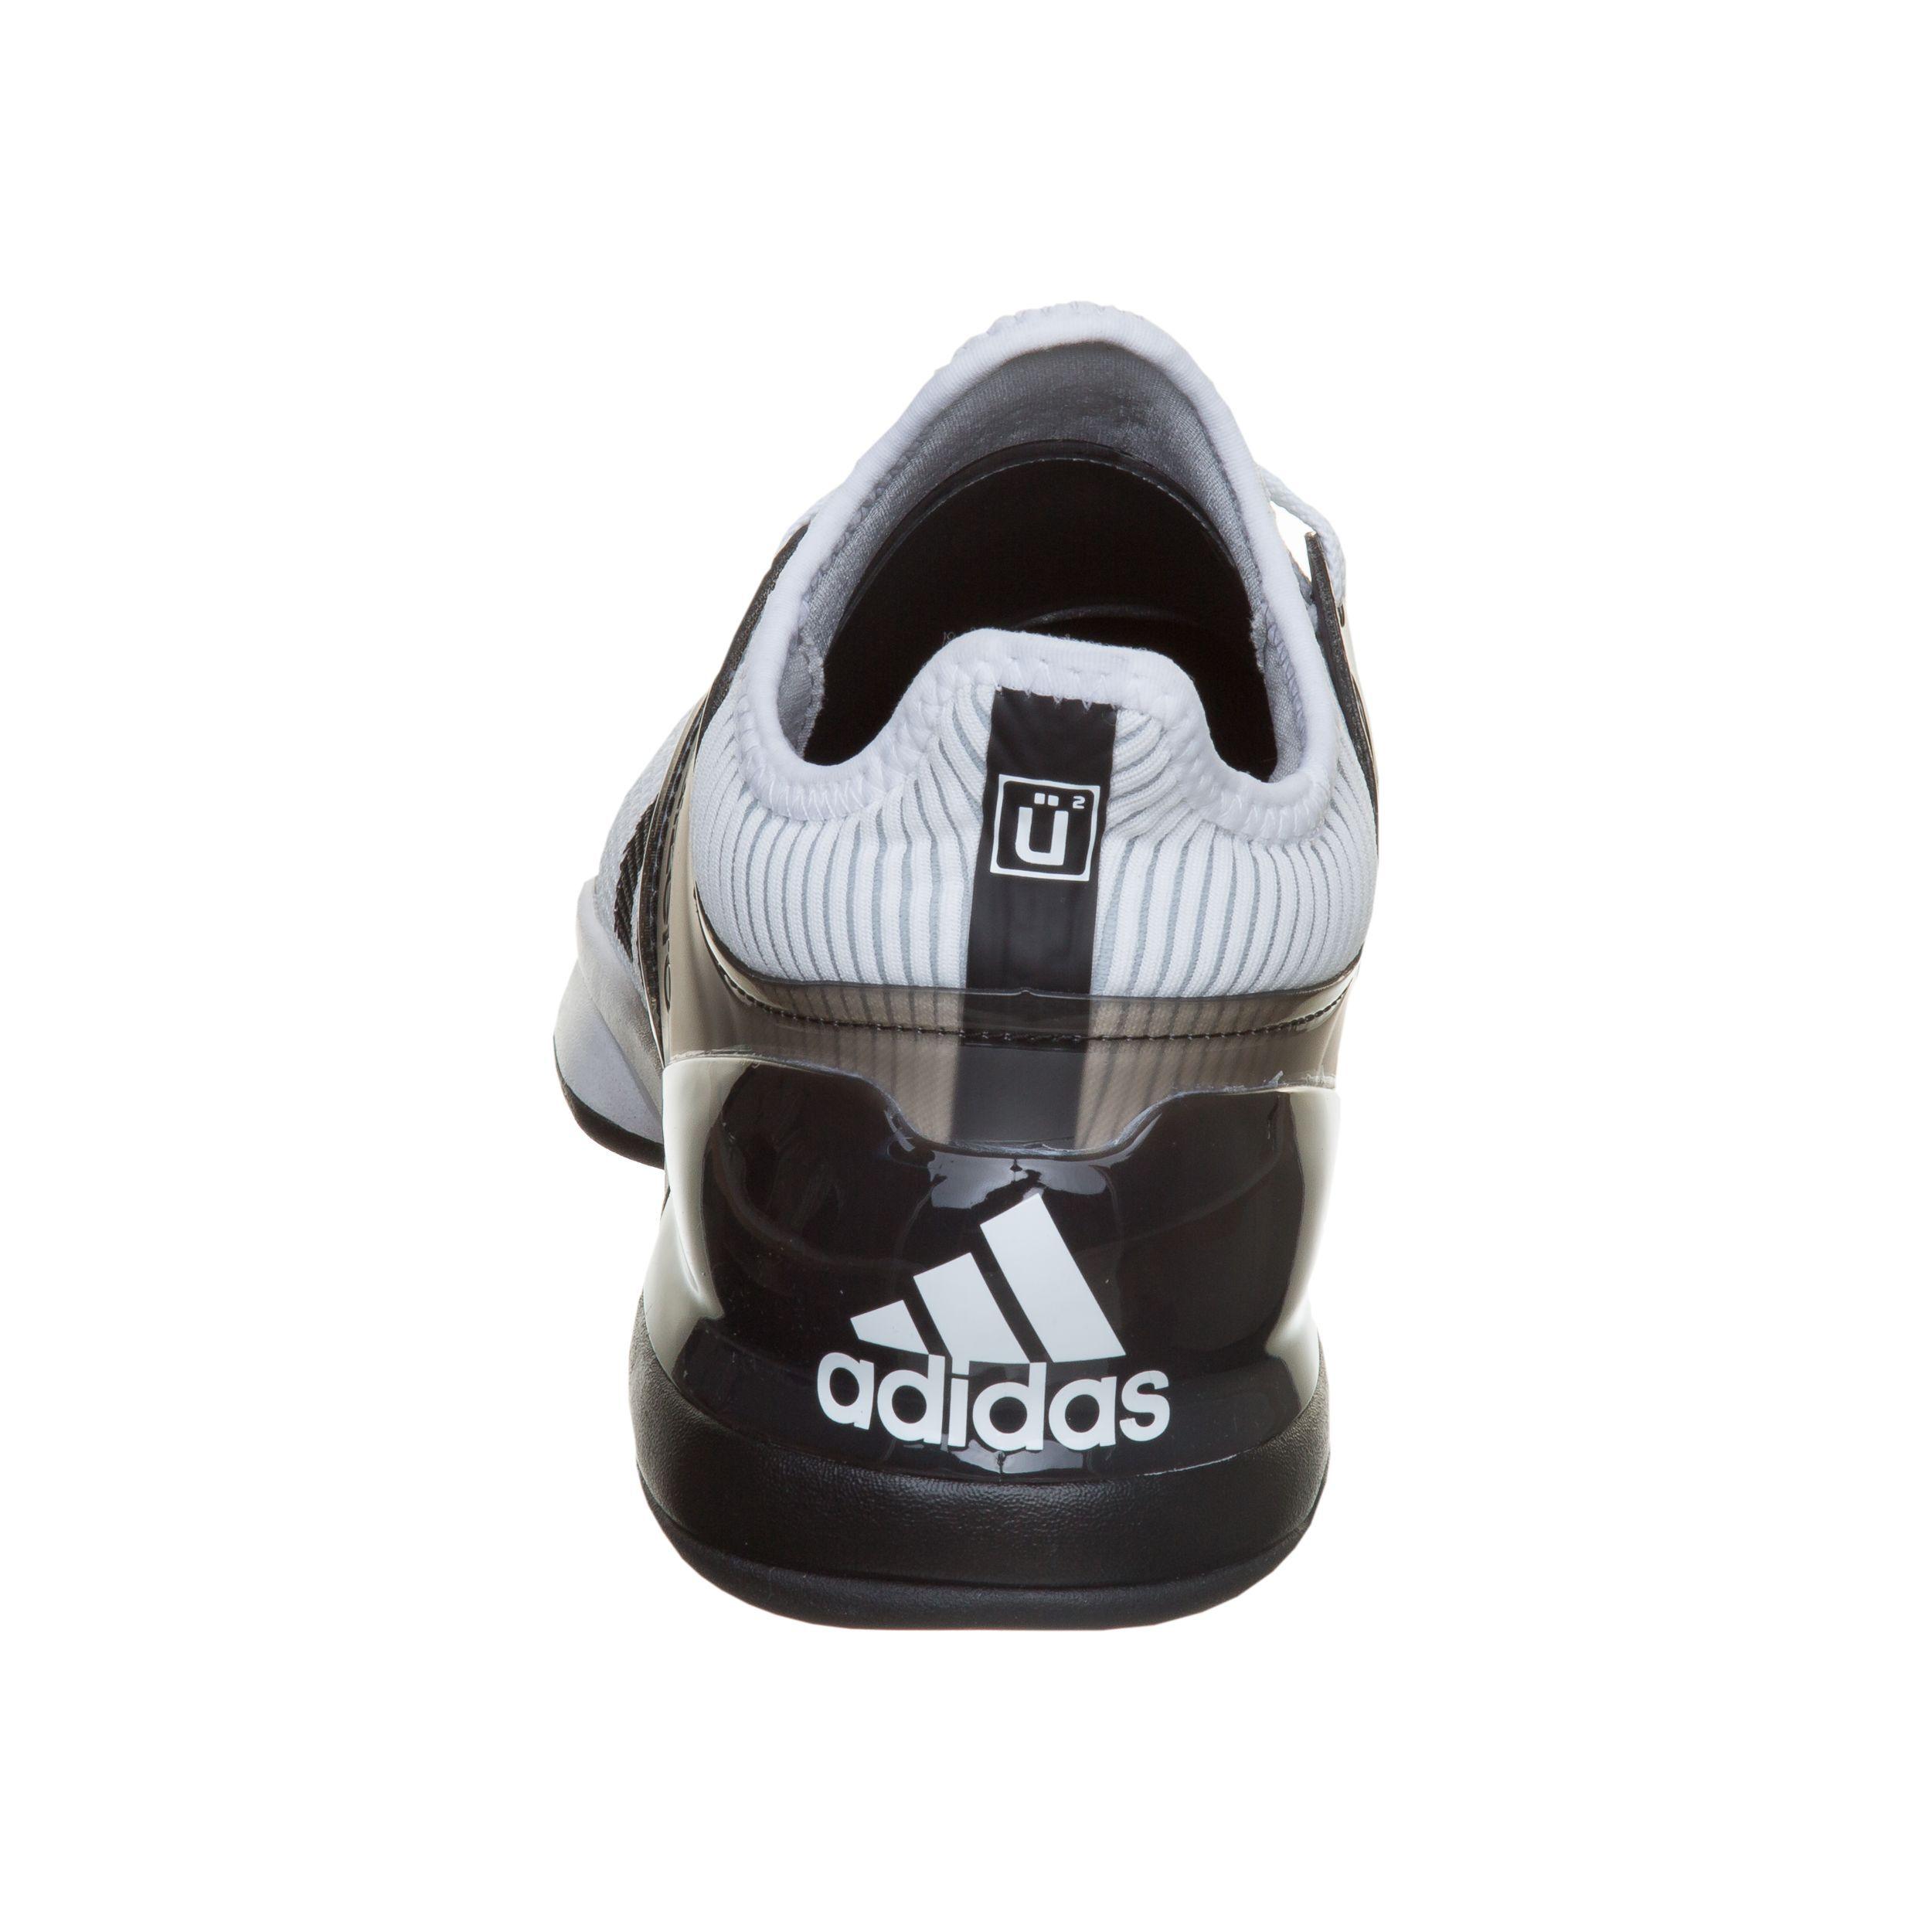 adidas Adizero Ubersonic 2 Chaussures Toutes Surfaces Hommes